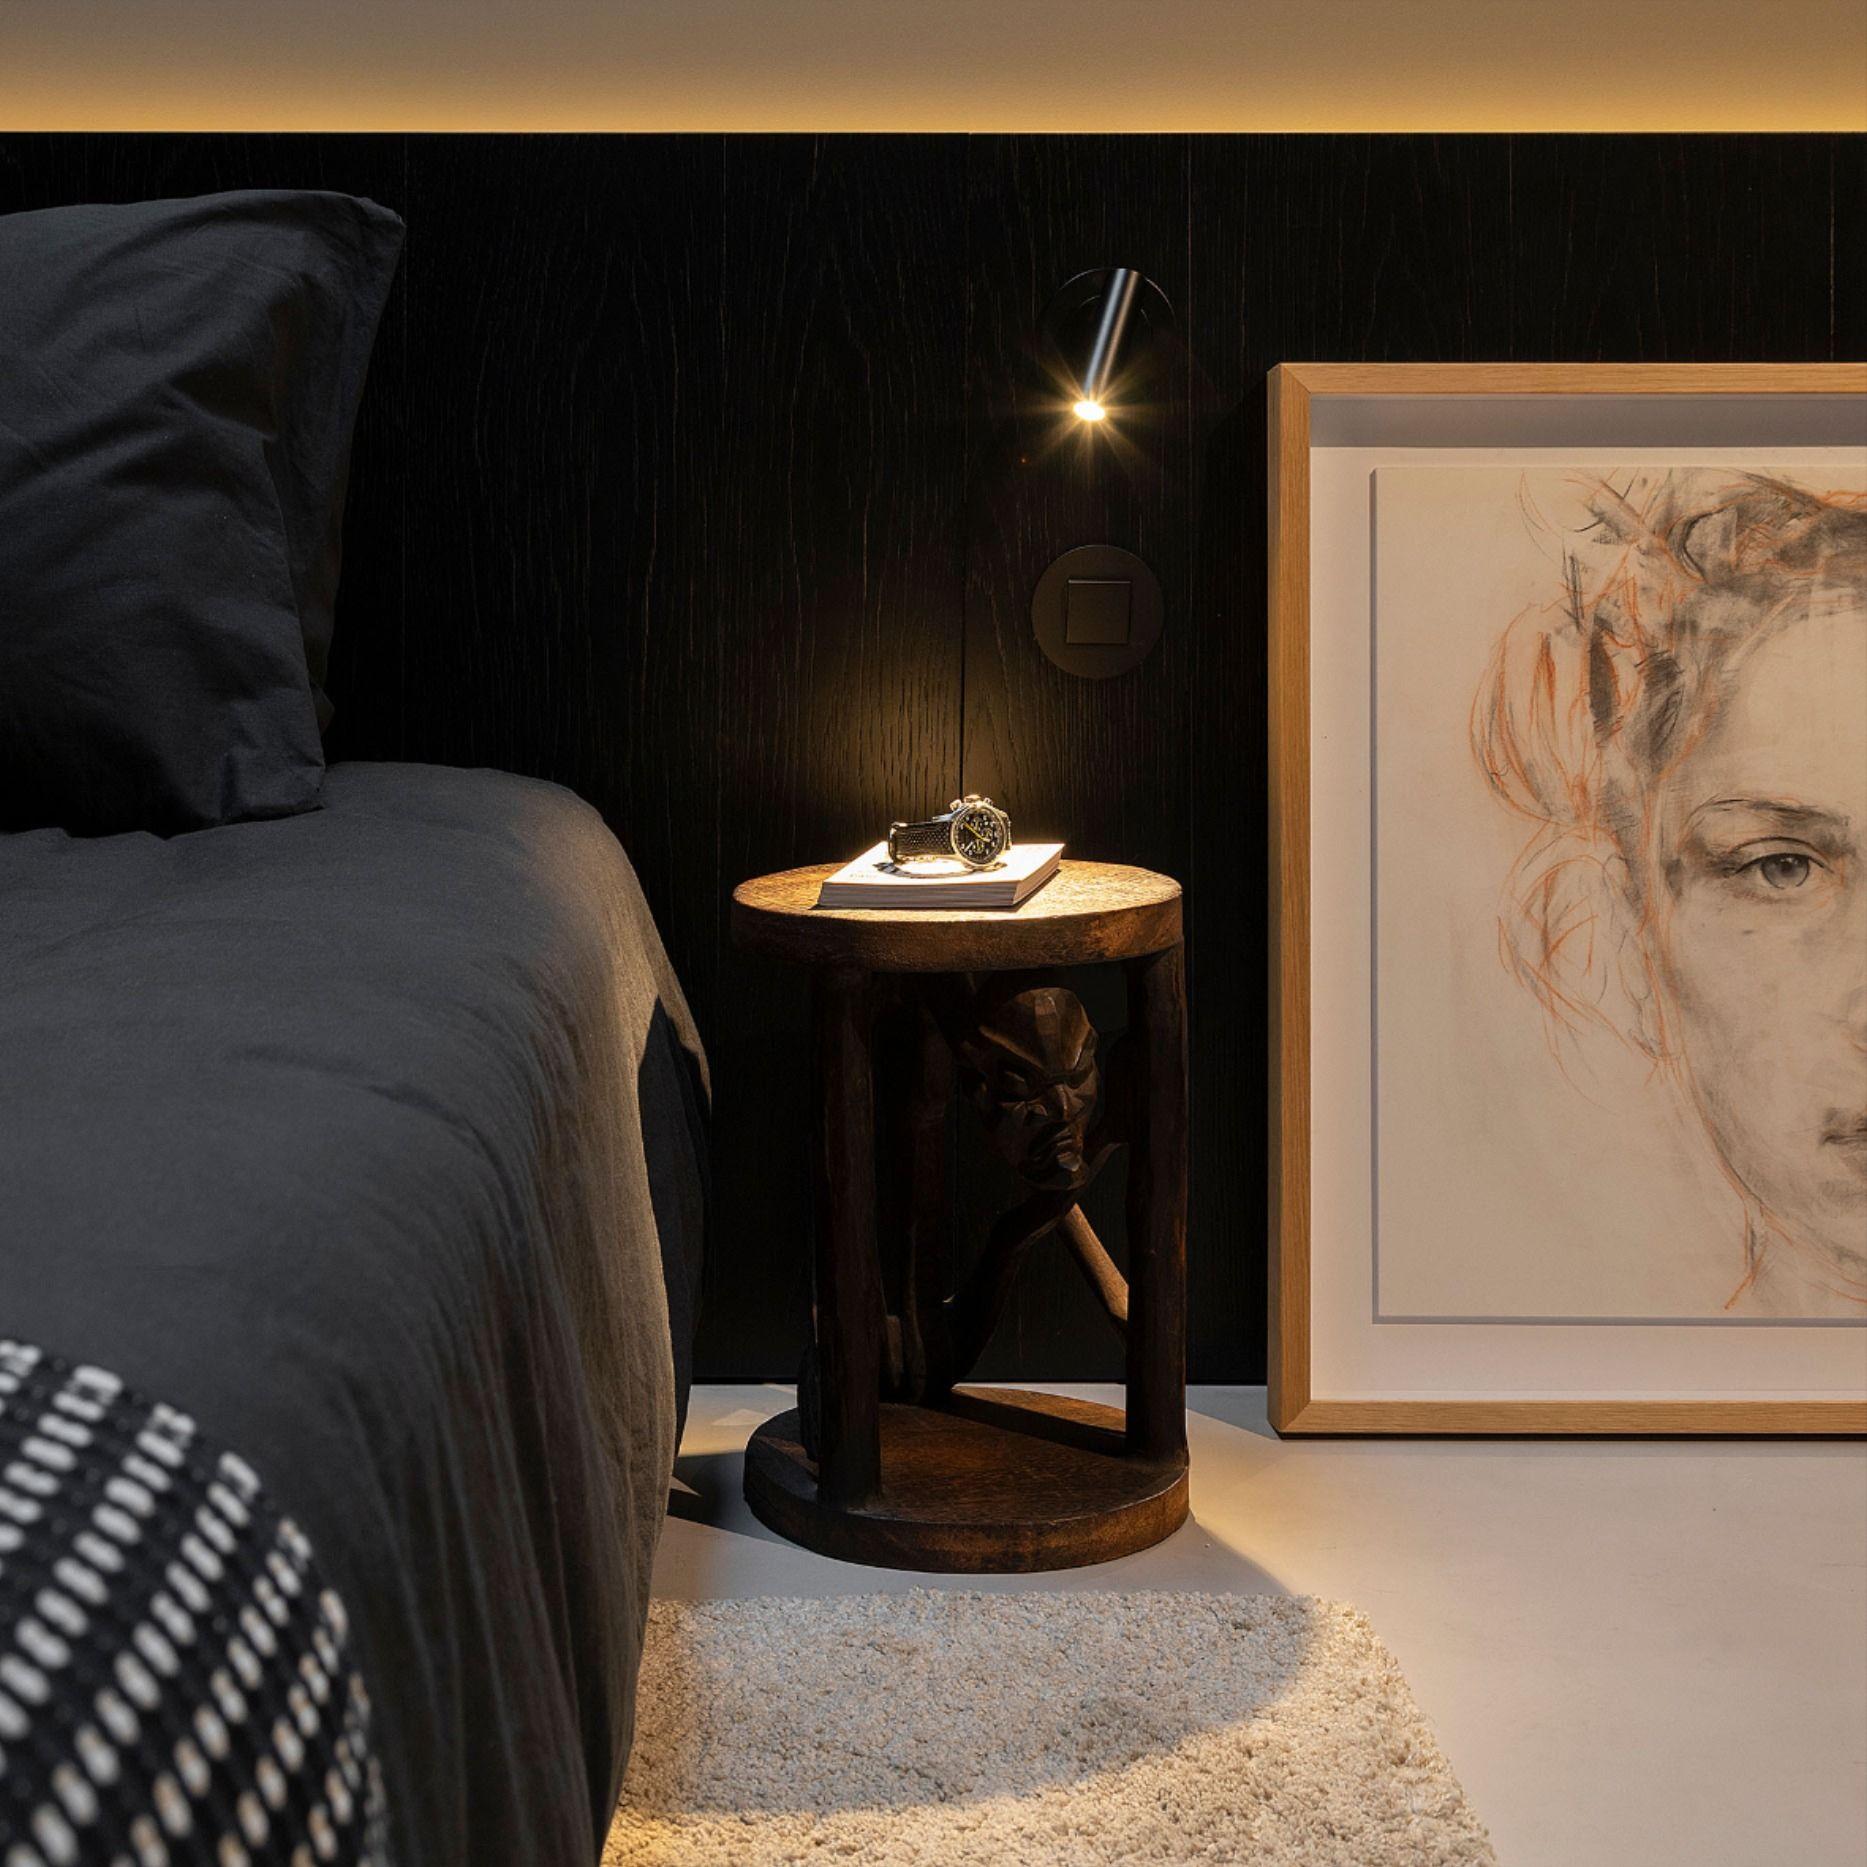 #ambientes #revistaambientes #mexicotieneambientes #roomporn #roomdecor #roomideas #roomdecorbedroom #roomorganization #roomsdecored #roomaesthetic #bedroomideas #bedroomdecor #bedroominspiration #bedroomideasmaster #bedroomdesign  #lamp #art #room